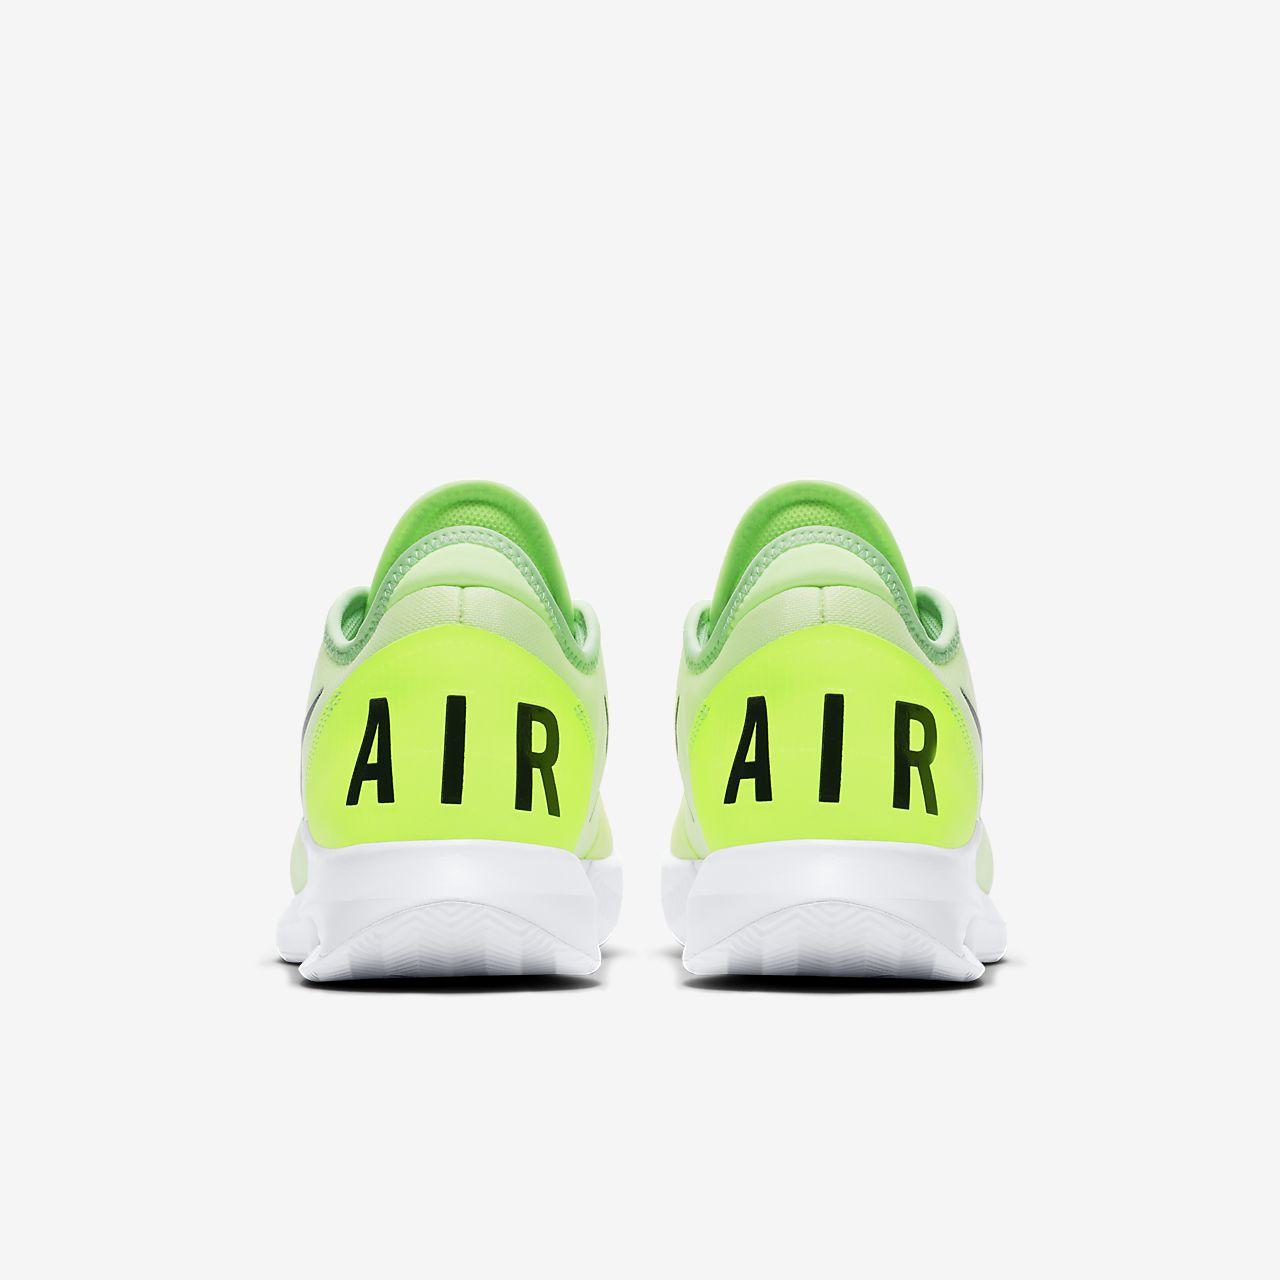 Tennissko NikeCourt Air Max Wildcard Clay för män